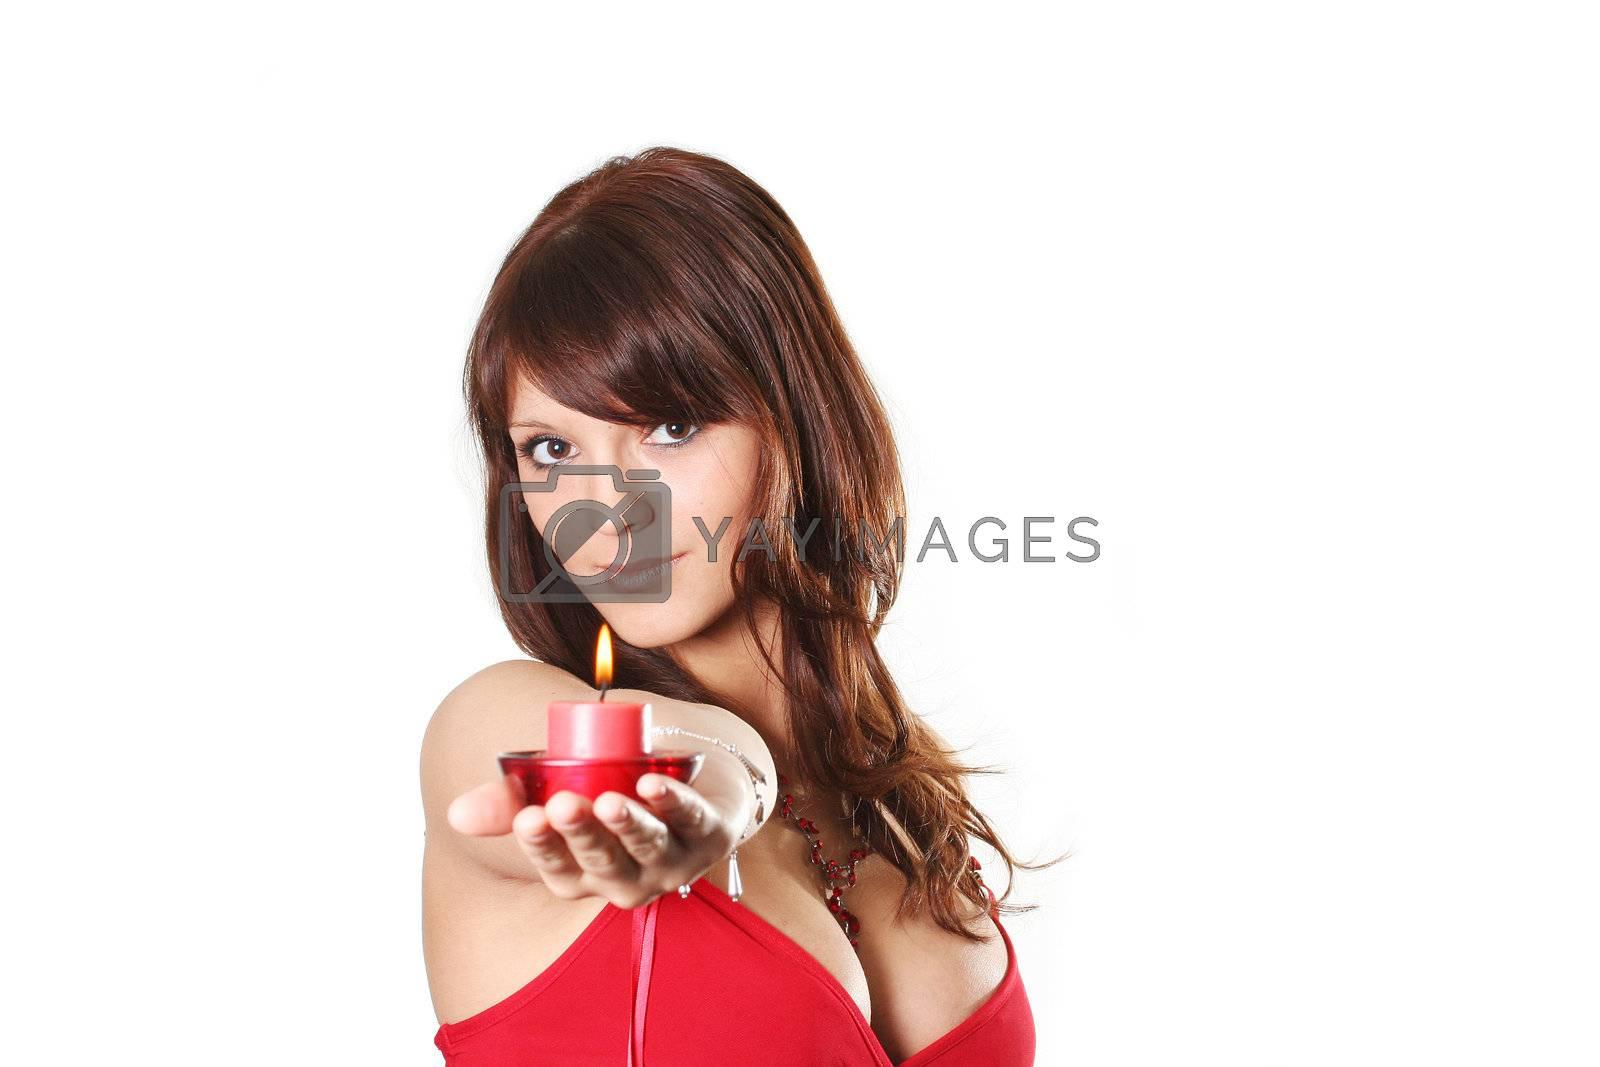 fashion heat candle face hair portrait females